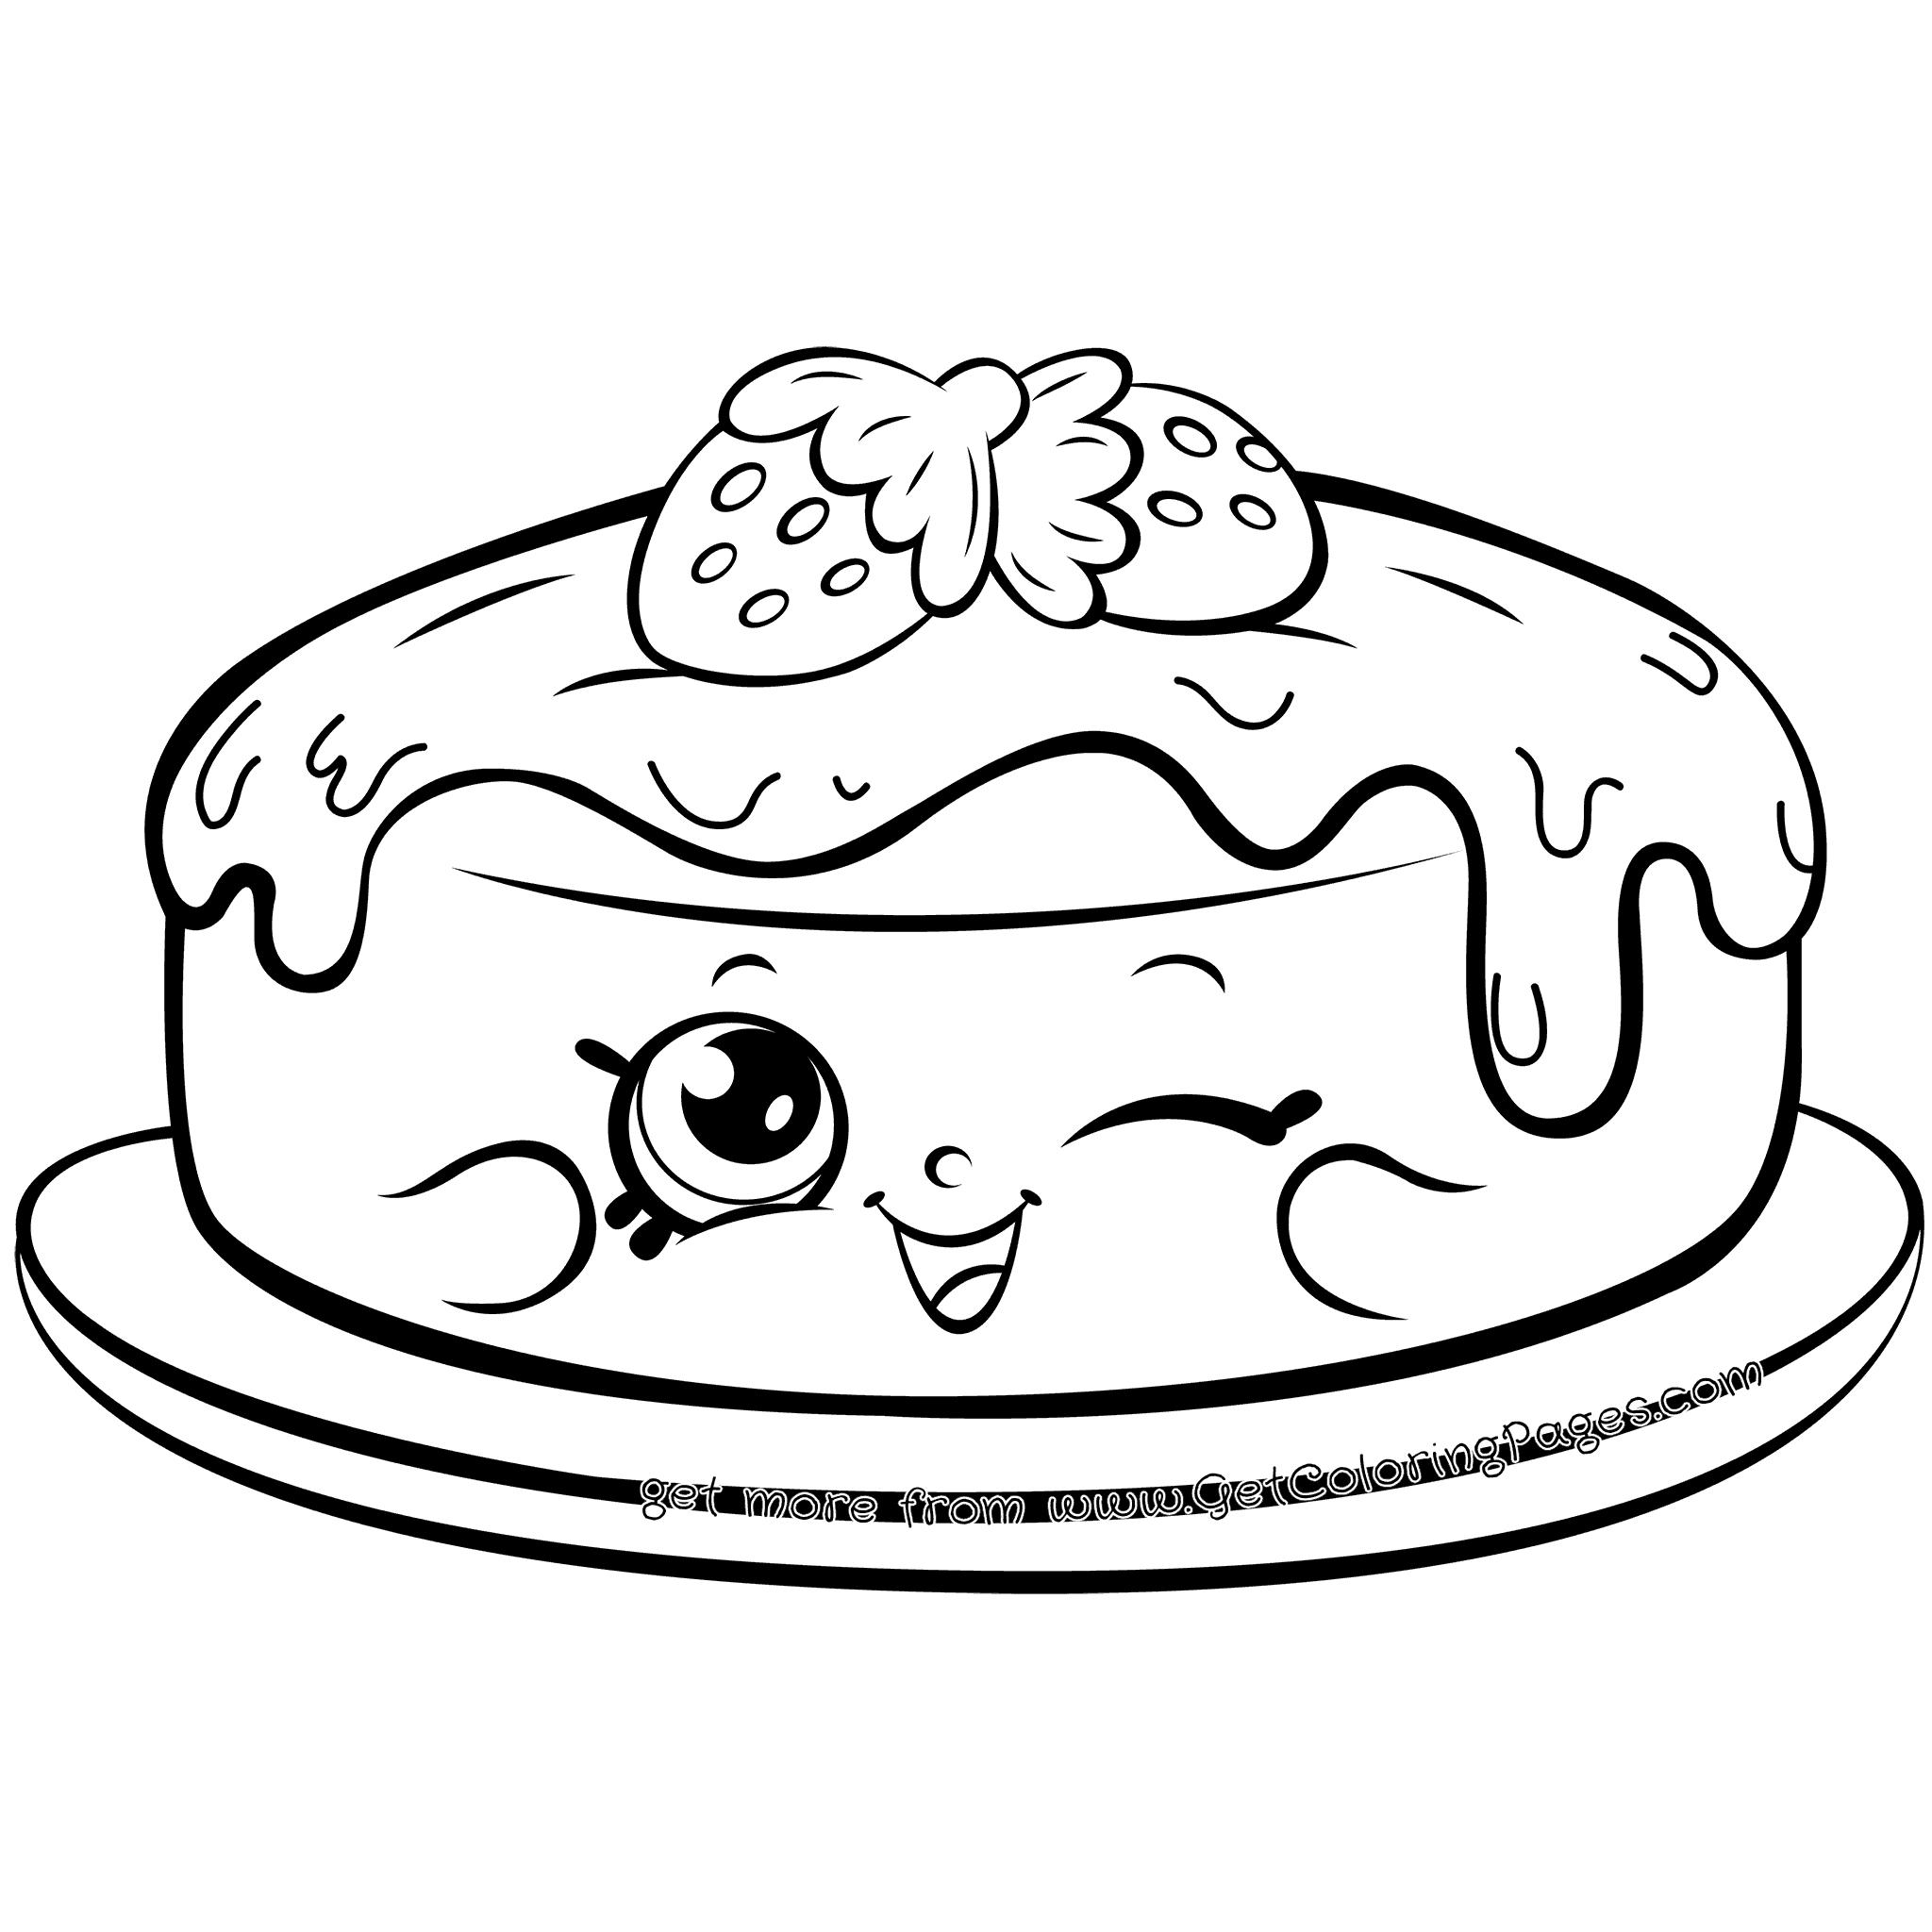 Shopkins 7 Shopkins Cake Fran Pancake Coloring Page